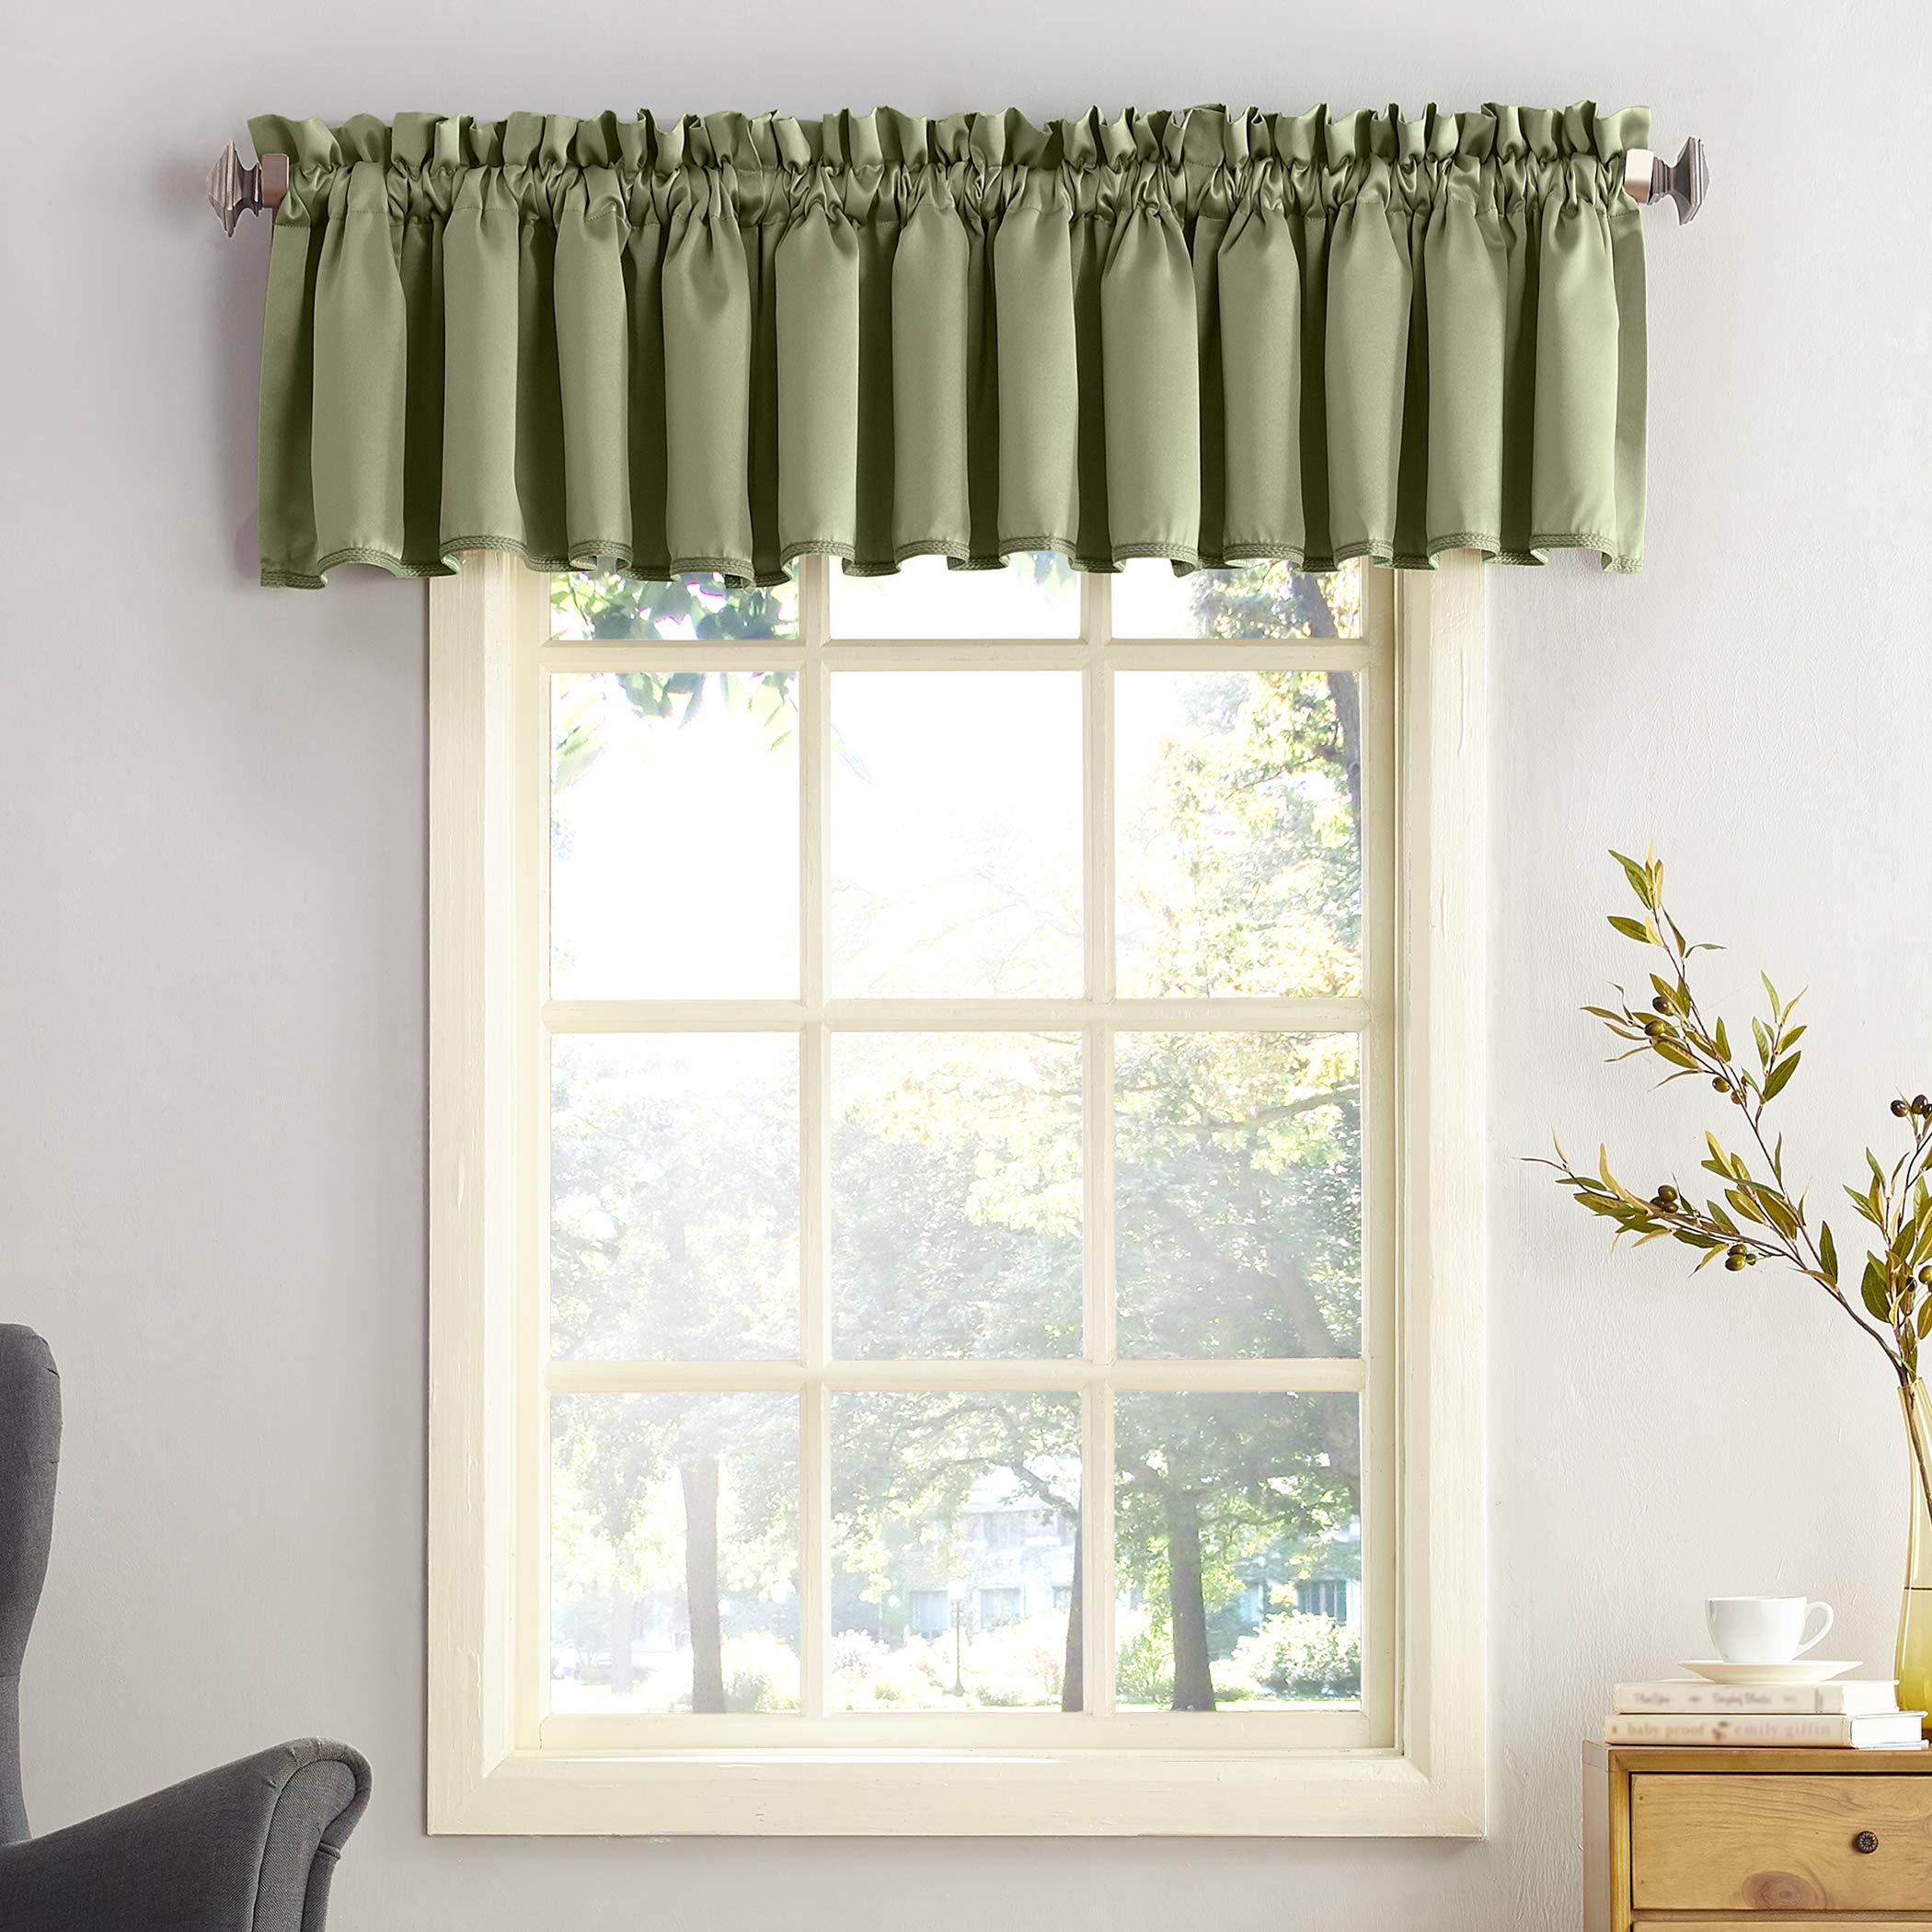 Sun Zero Barrow Energy Efficient Rod Pocket Curtain Valance, 54'' x 18'', Sage Green by Sun Zero